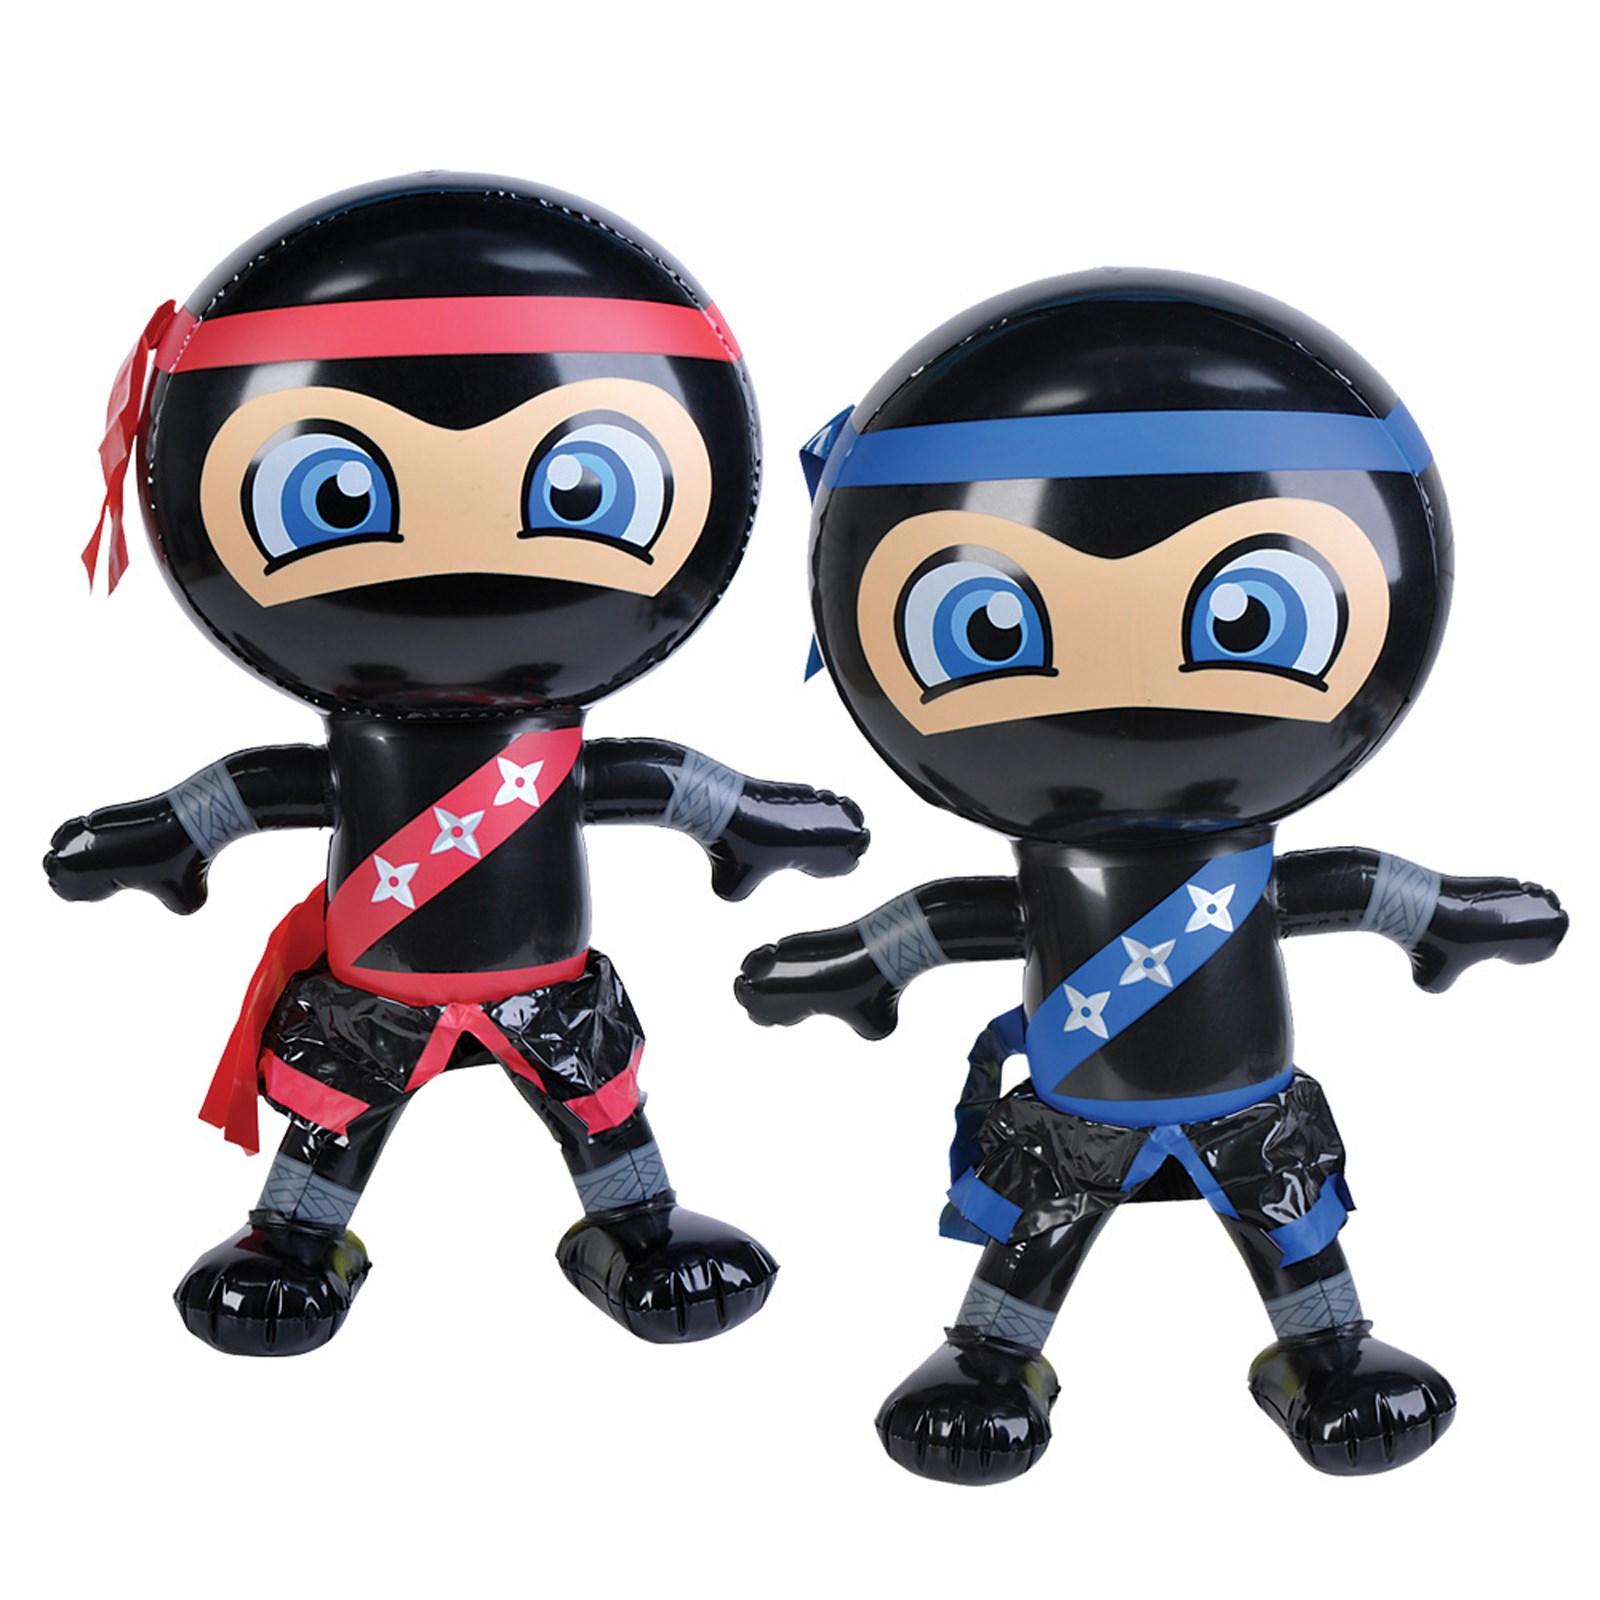 Image of Inflatable Ninja